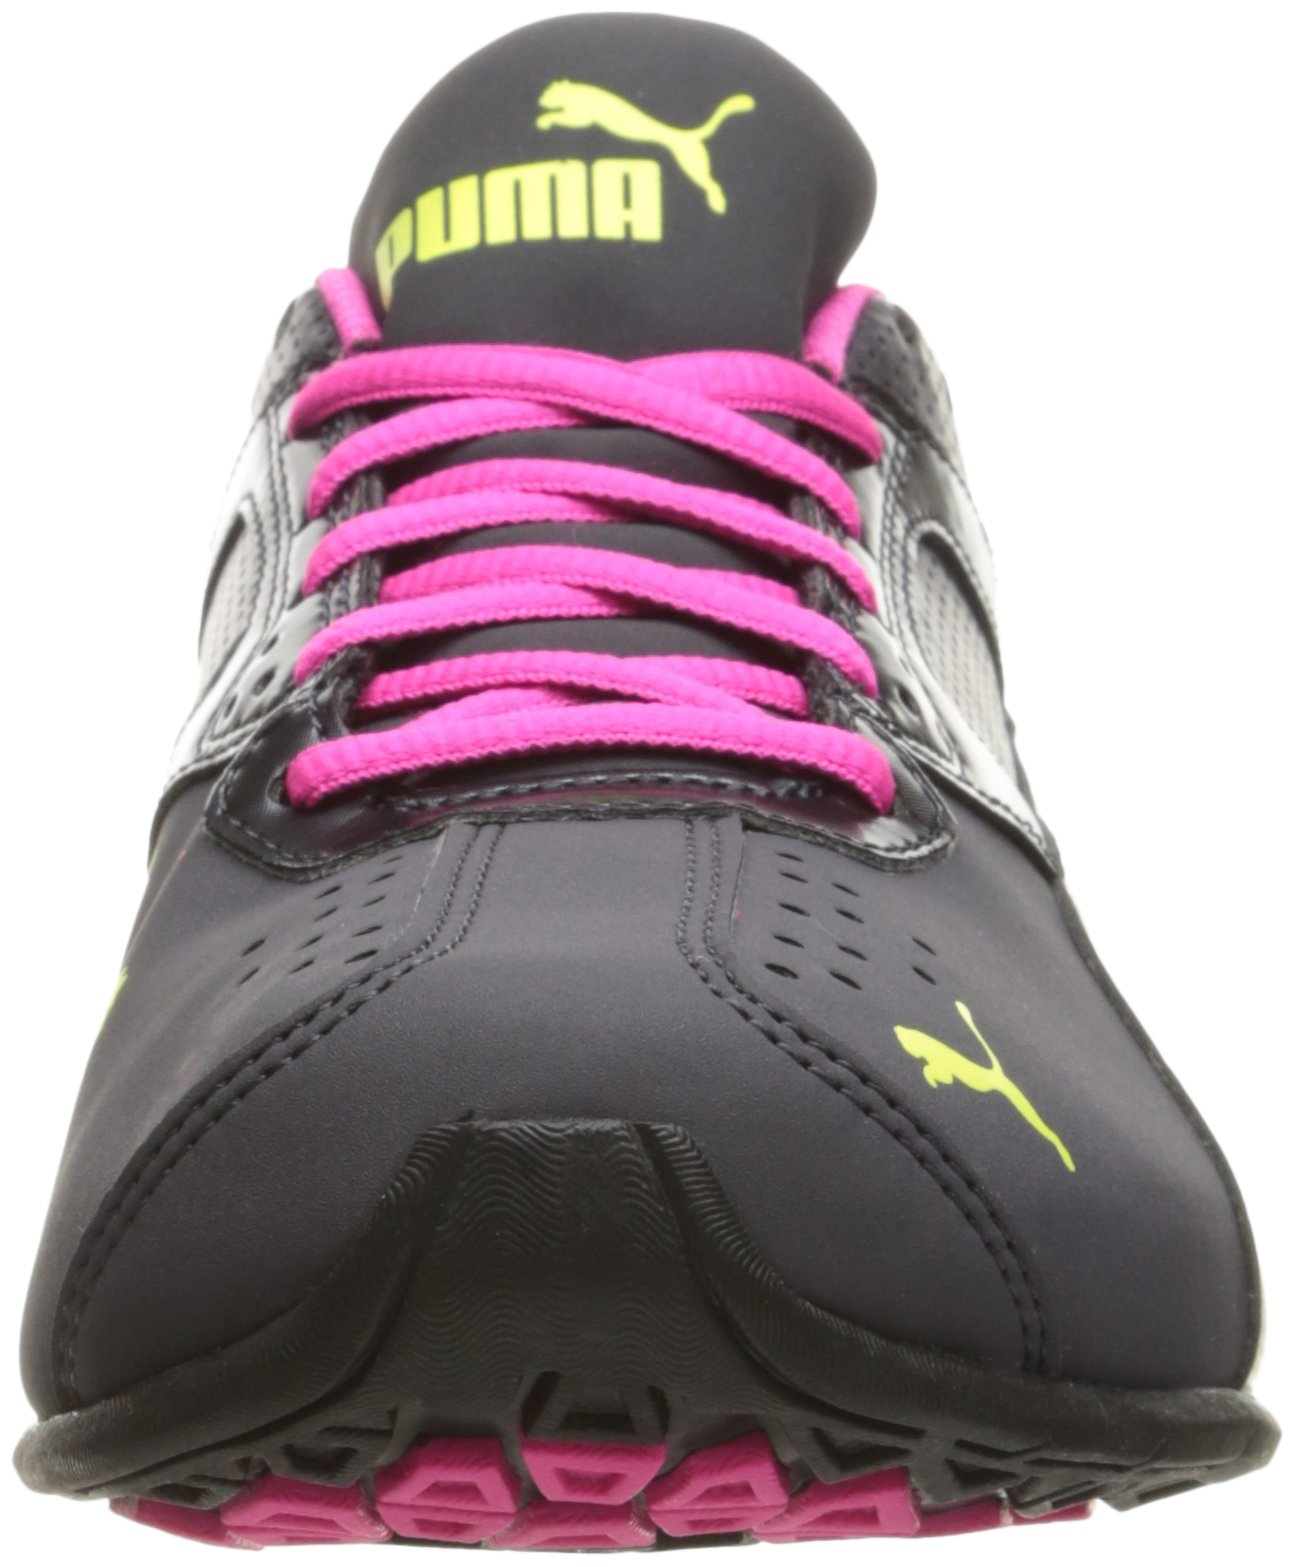 PUMA Women's Tazon 6 WN's fm Sneaker Periscope Silver-Pink glo, 6 M US by PUMA (Image #4)